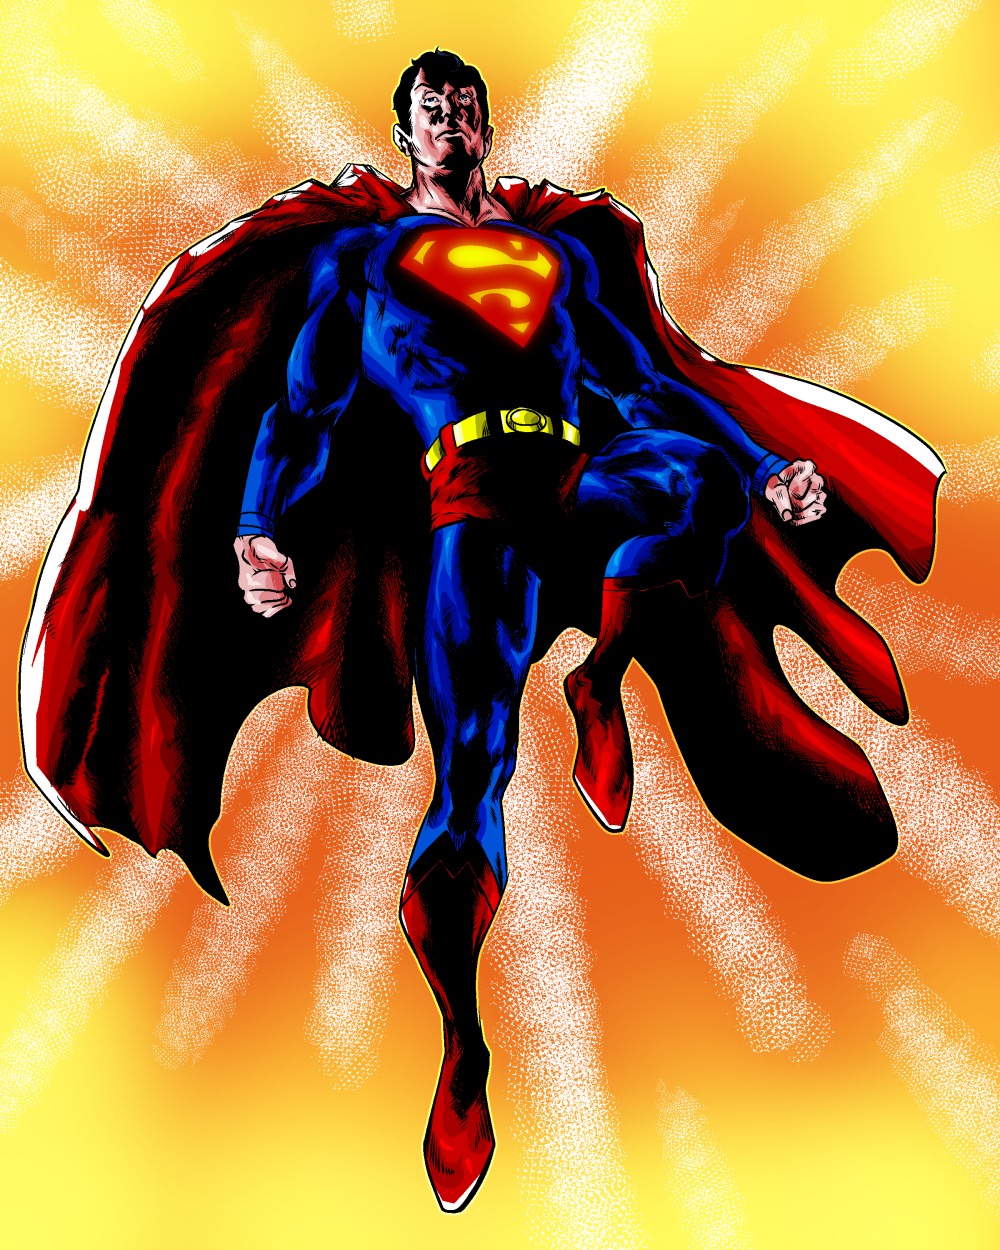 Staz' Superman